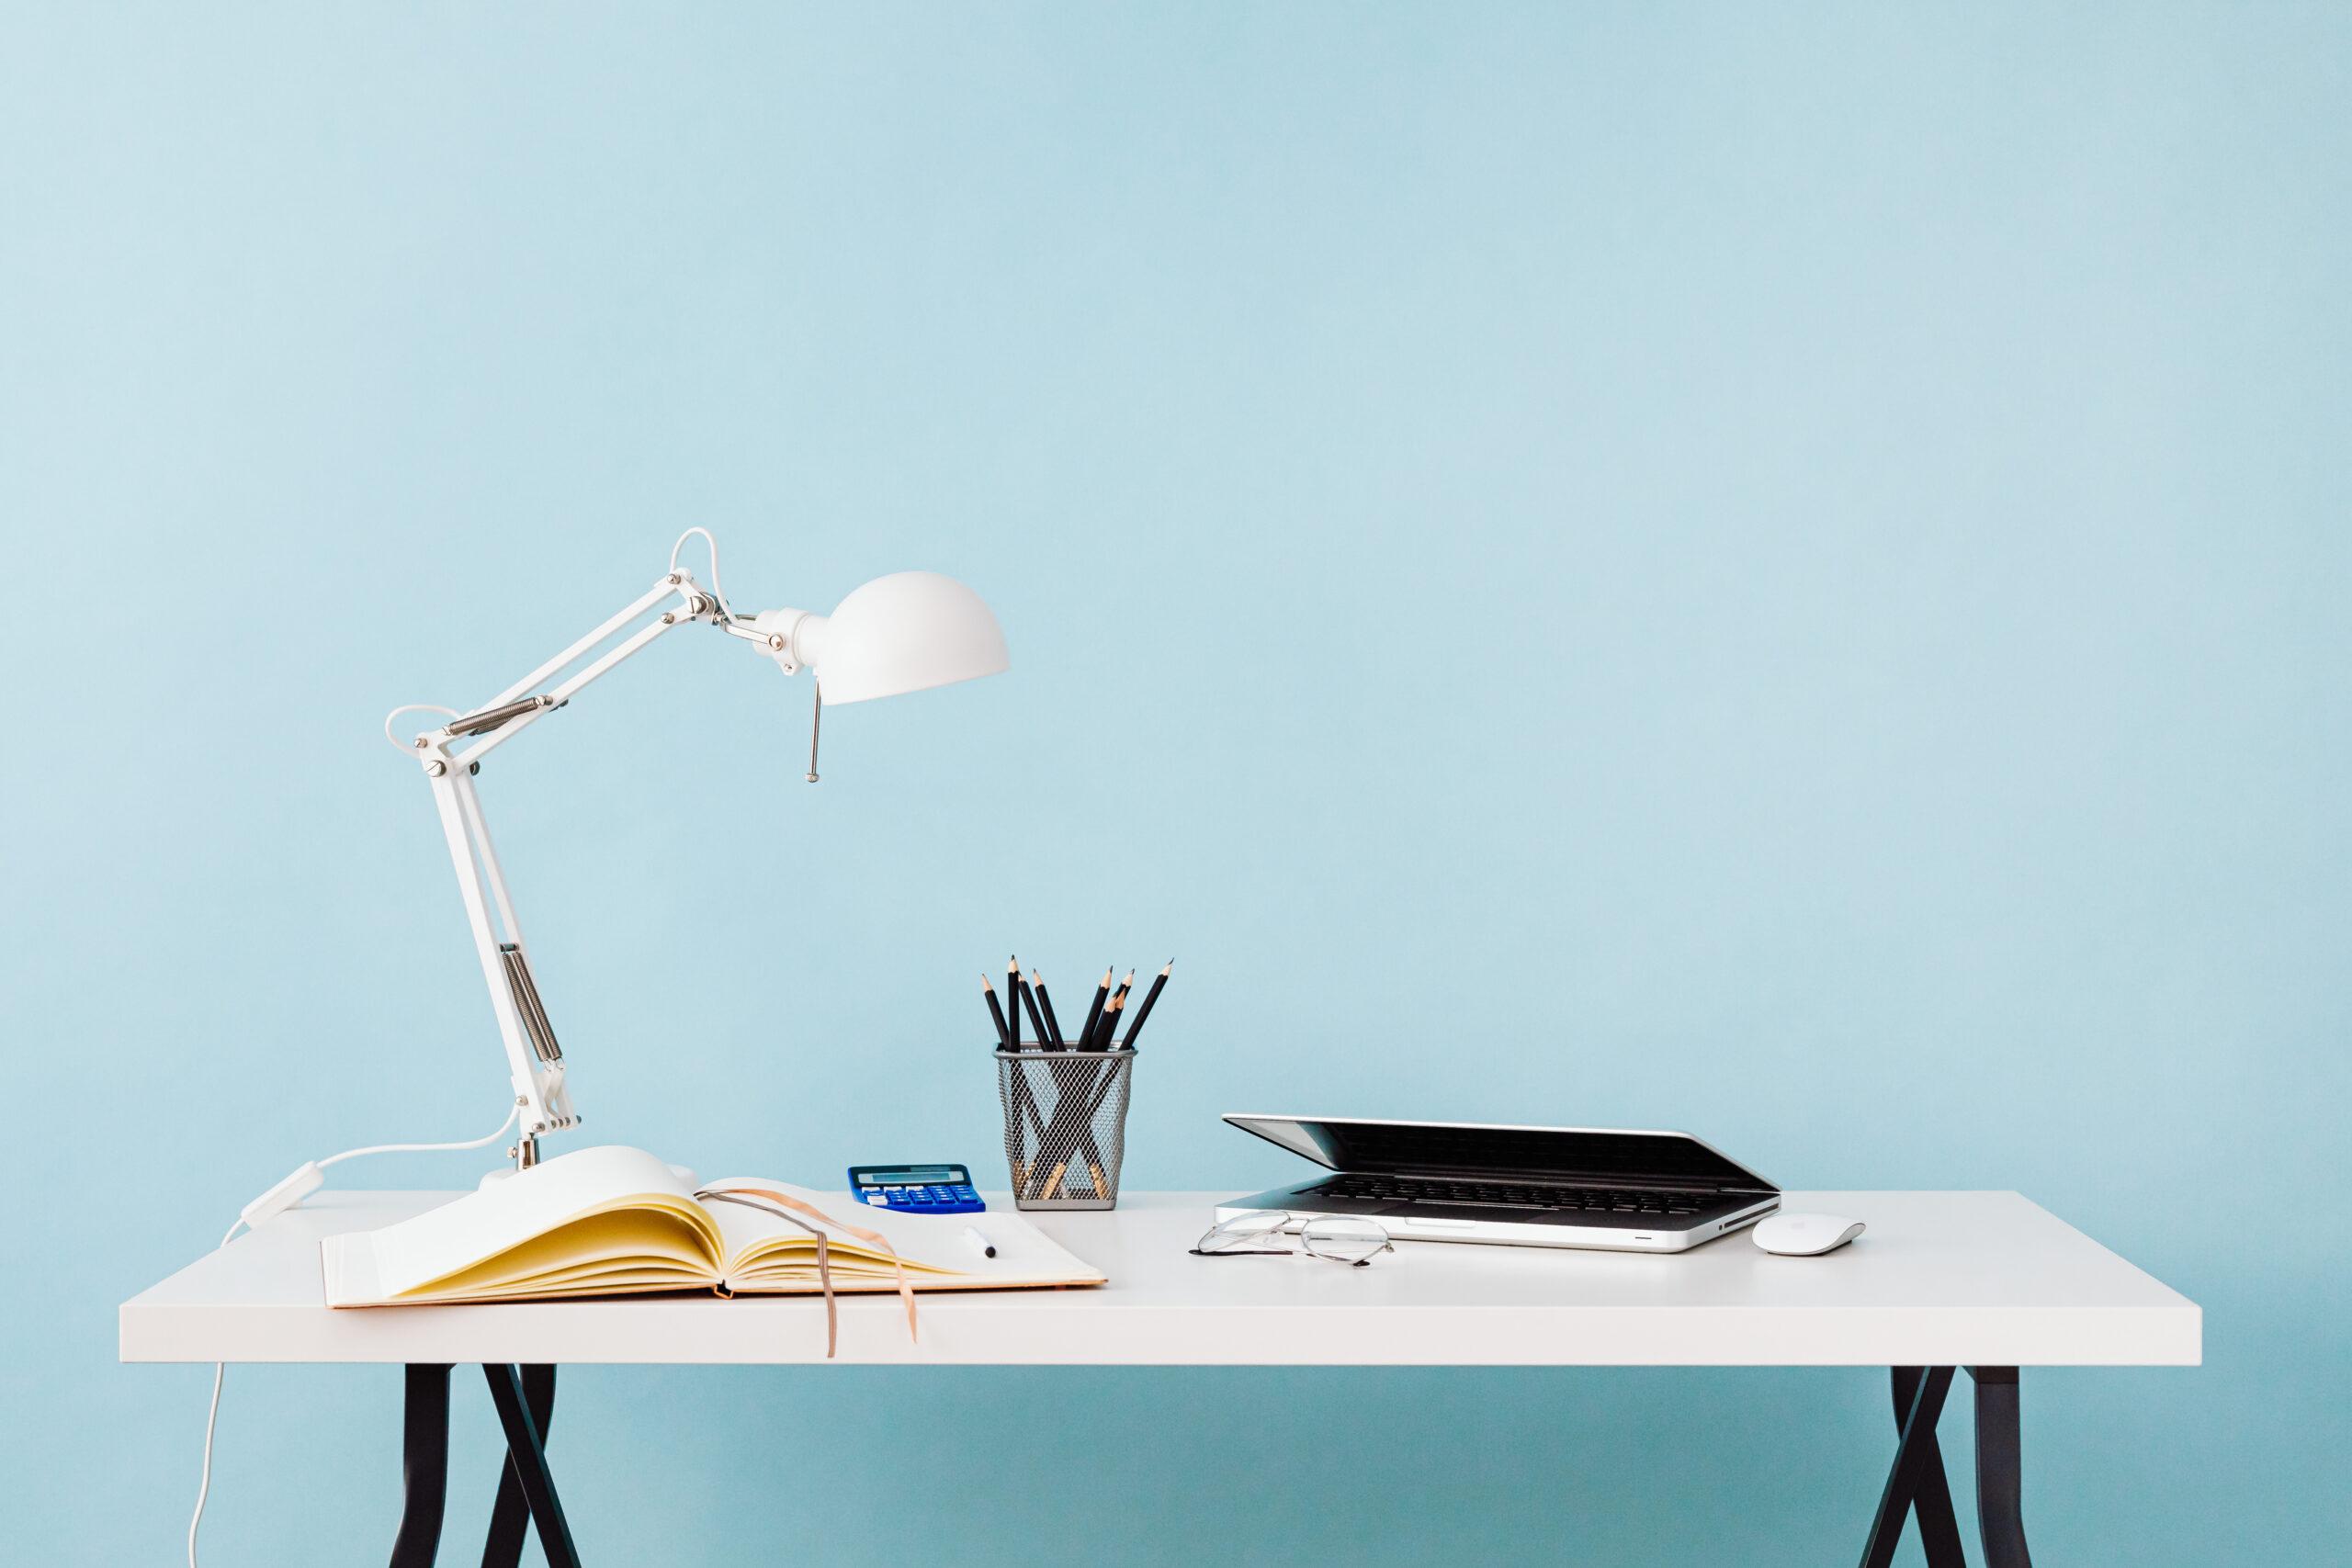 kaboompics_Desk - notebook - lamp - organizer - pencils